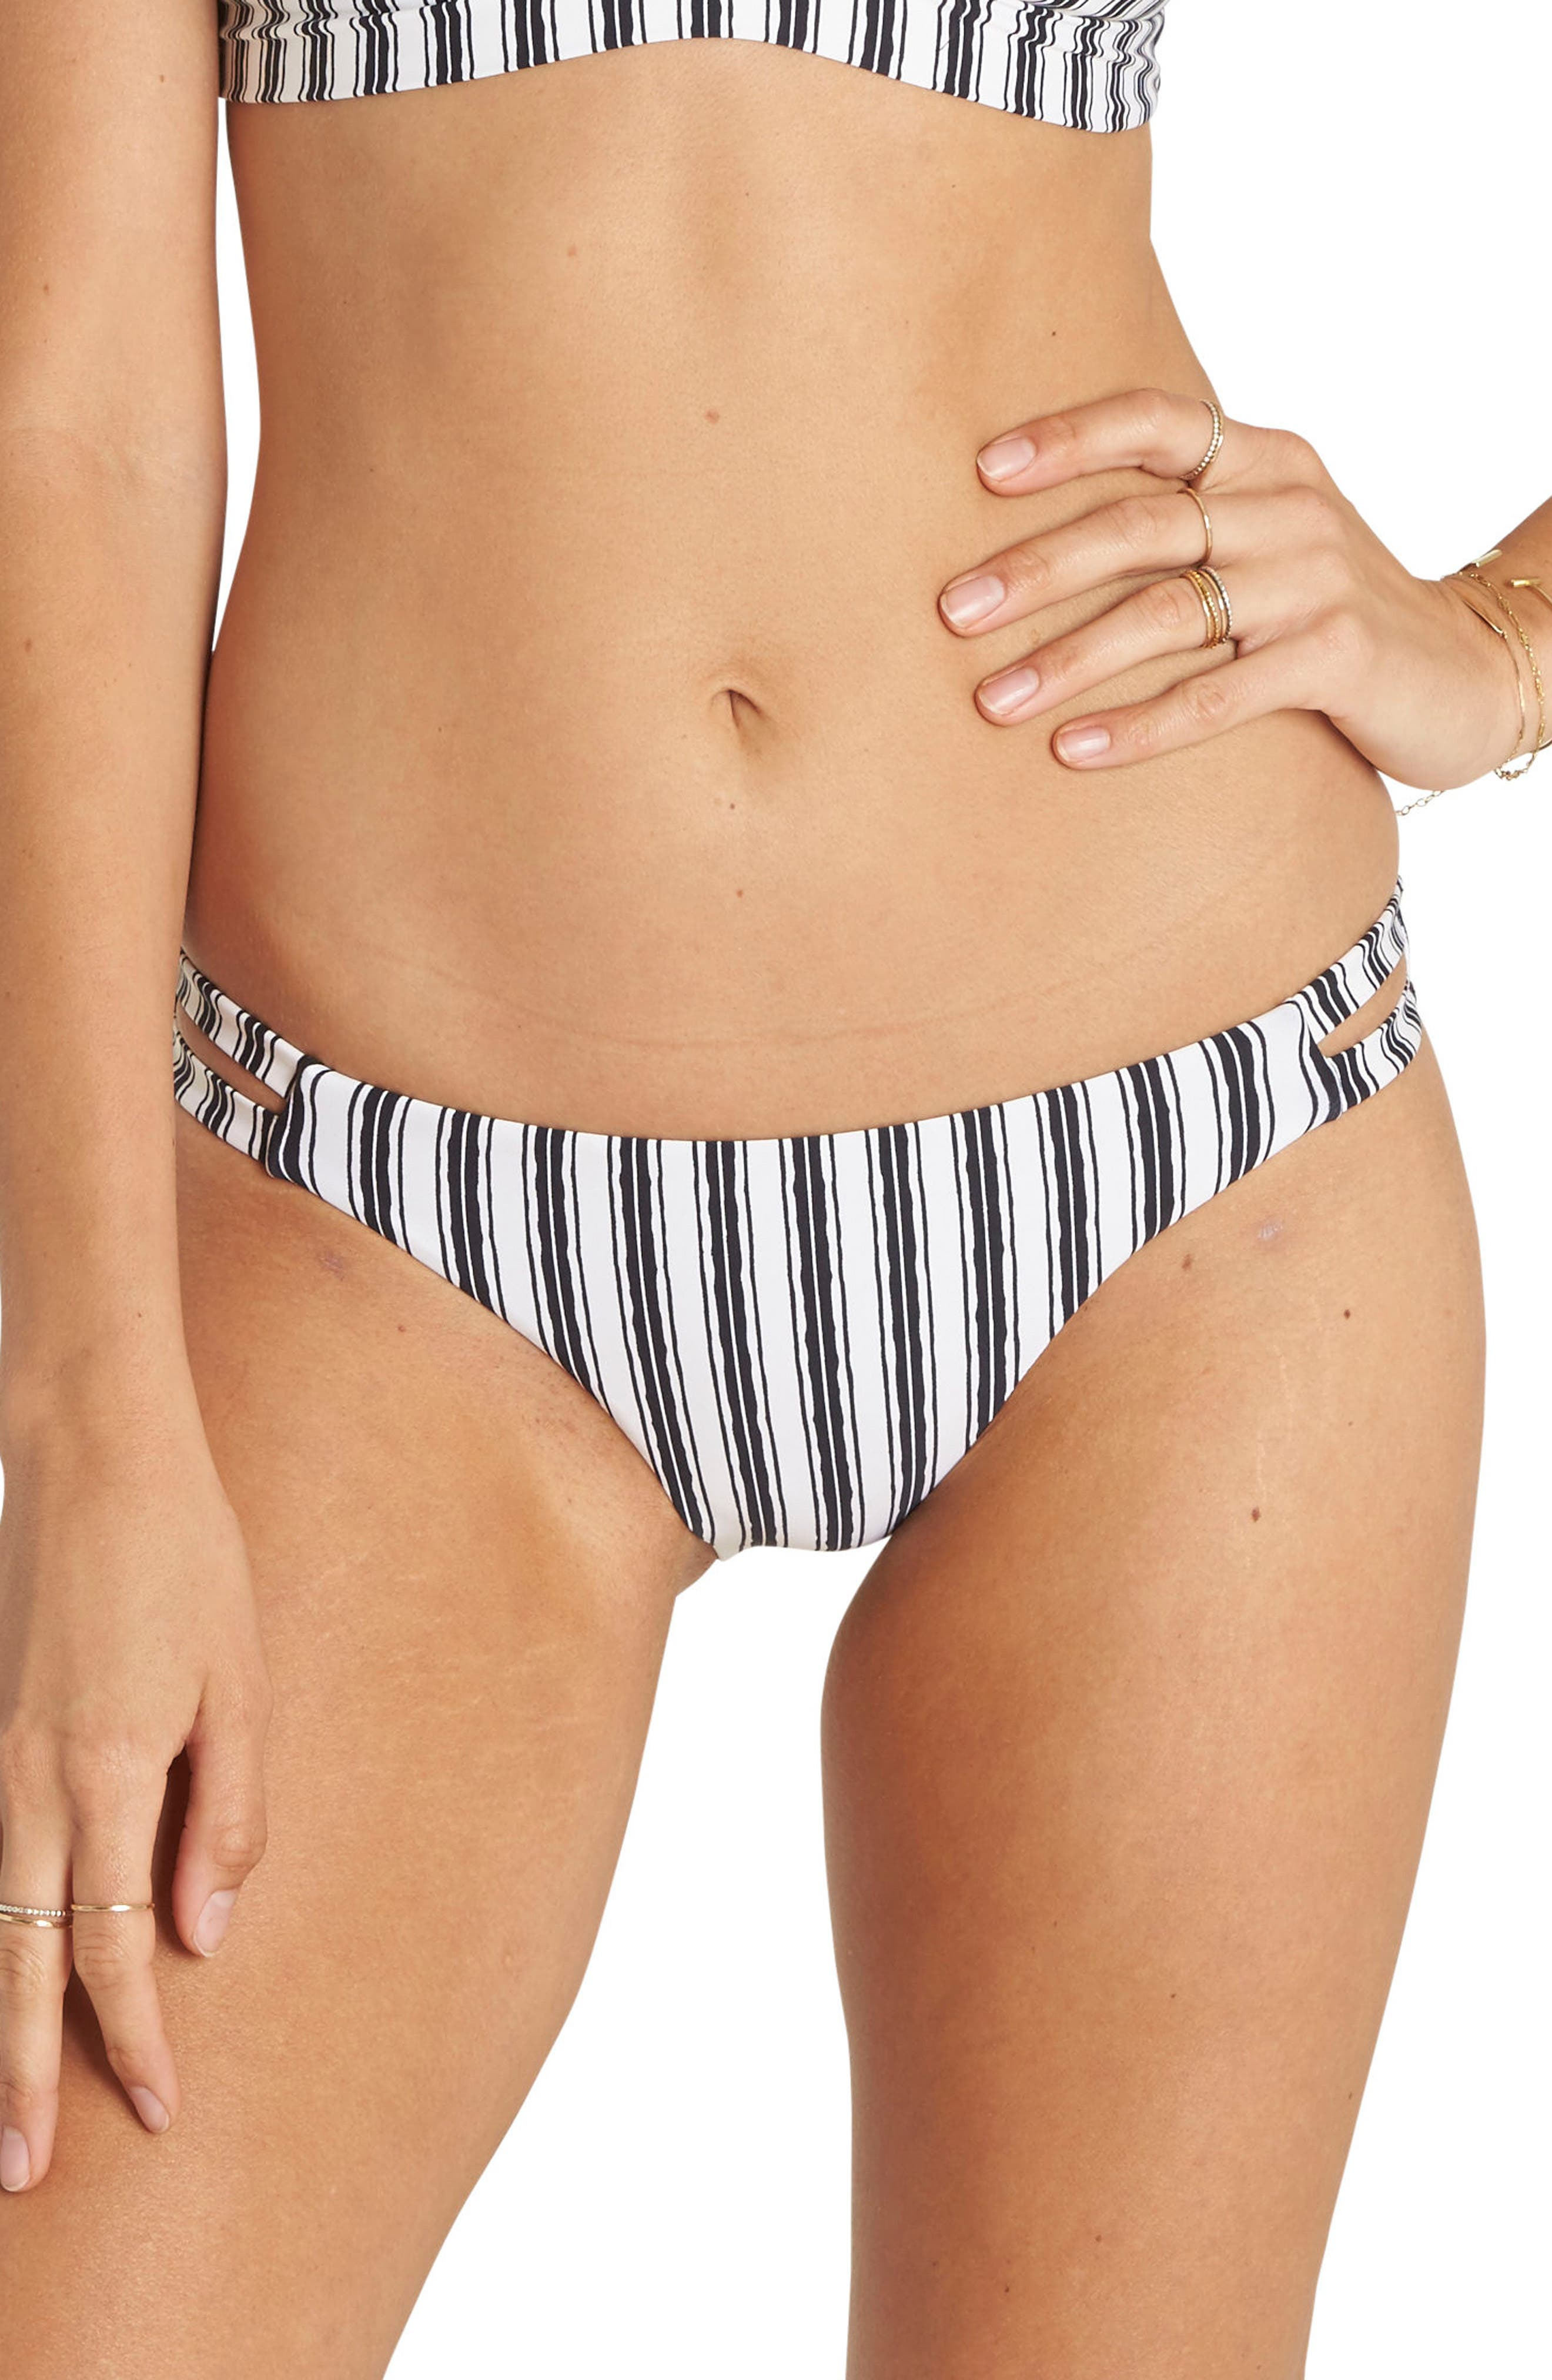 Get in Line Lowrider Bikini Bottoms,                             Main thumbnail 1, color,